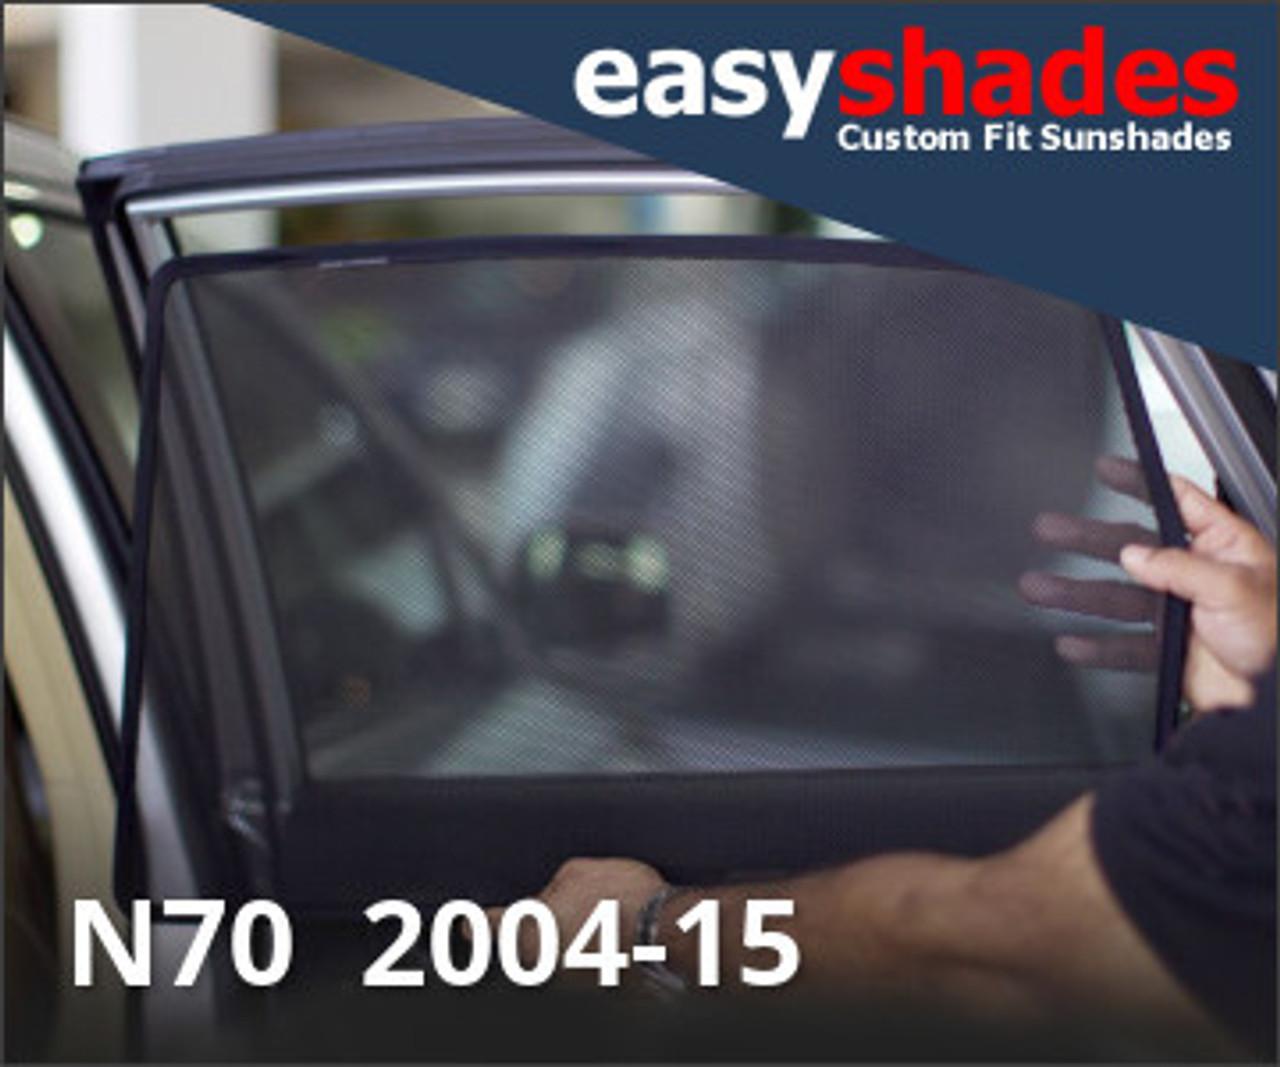 N70 2004-15